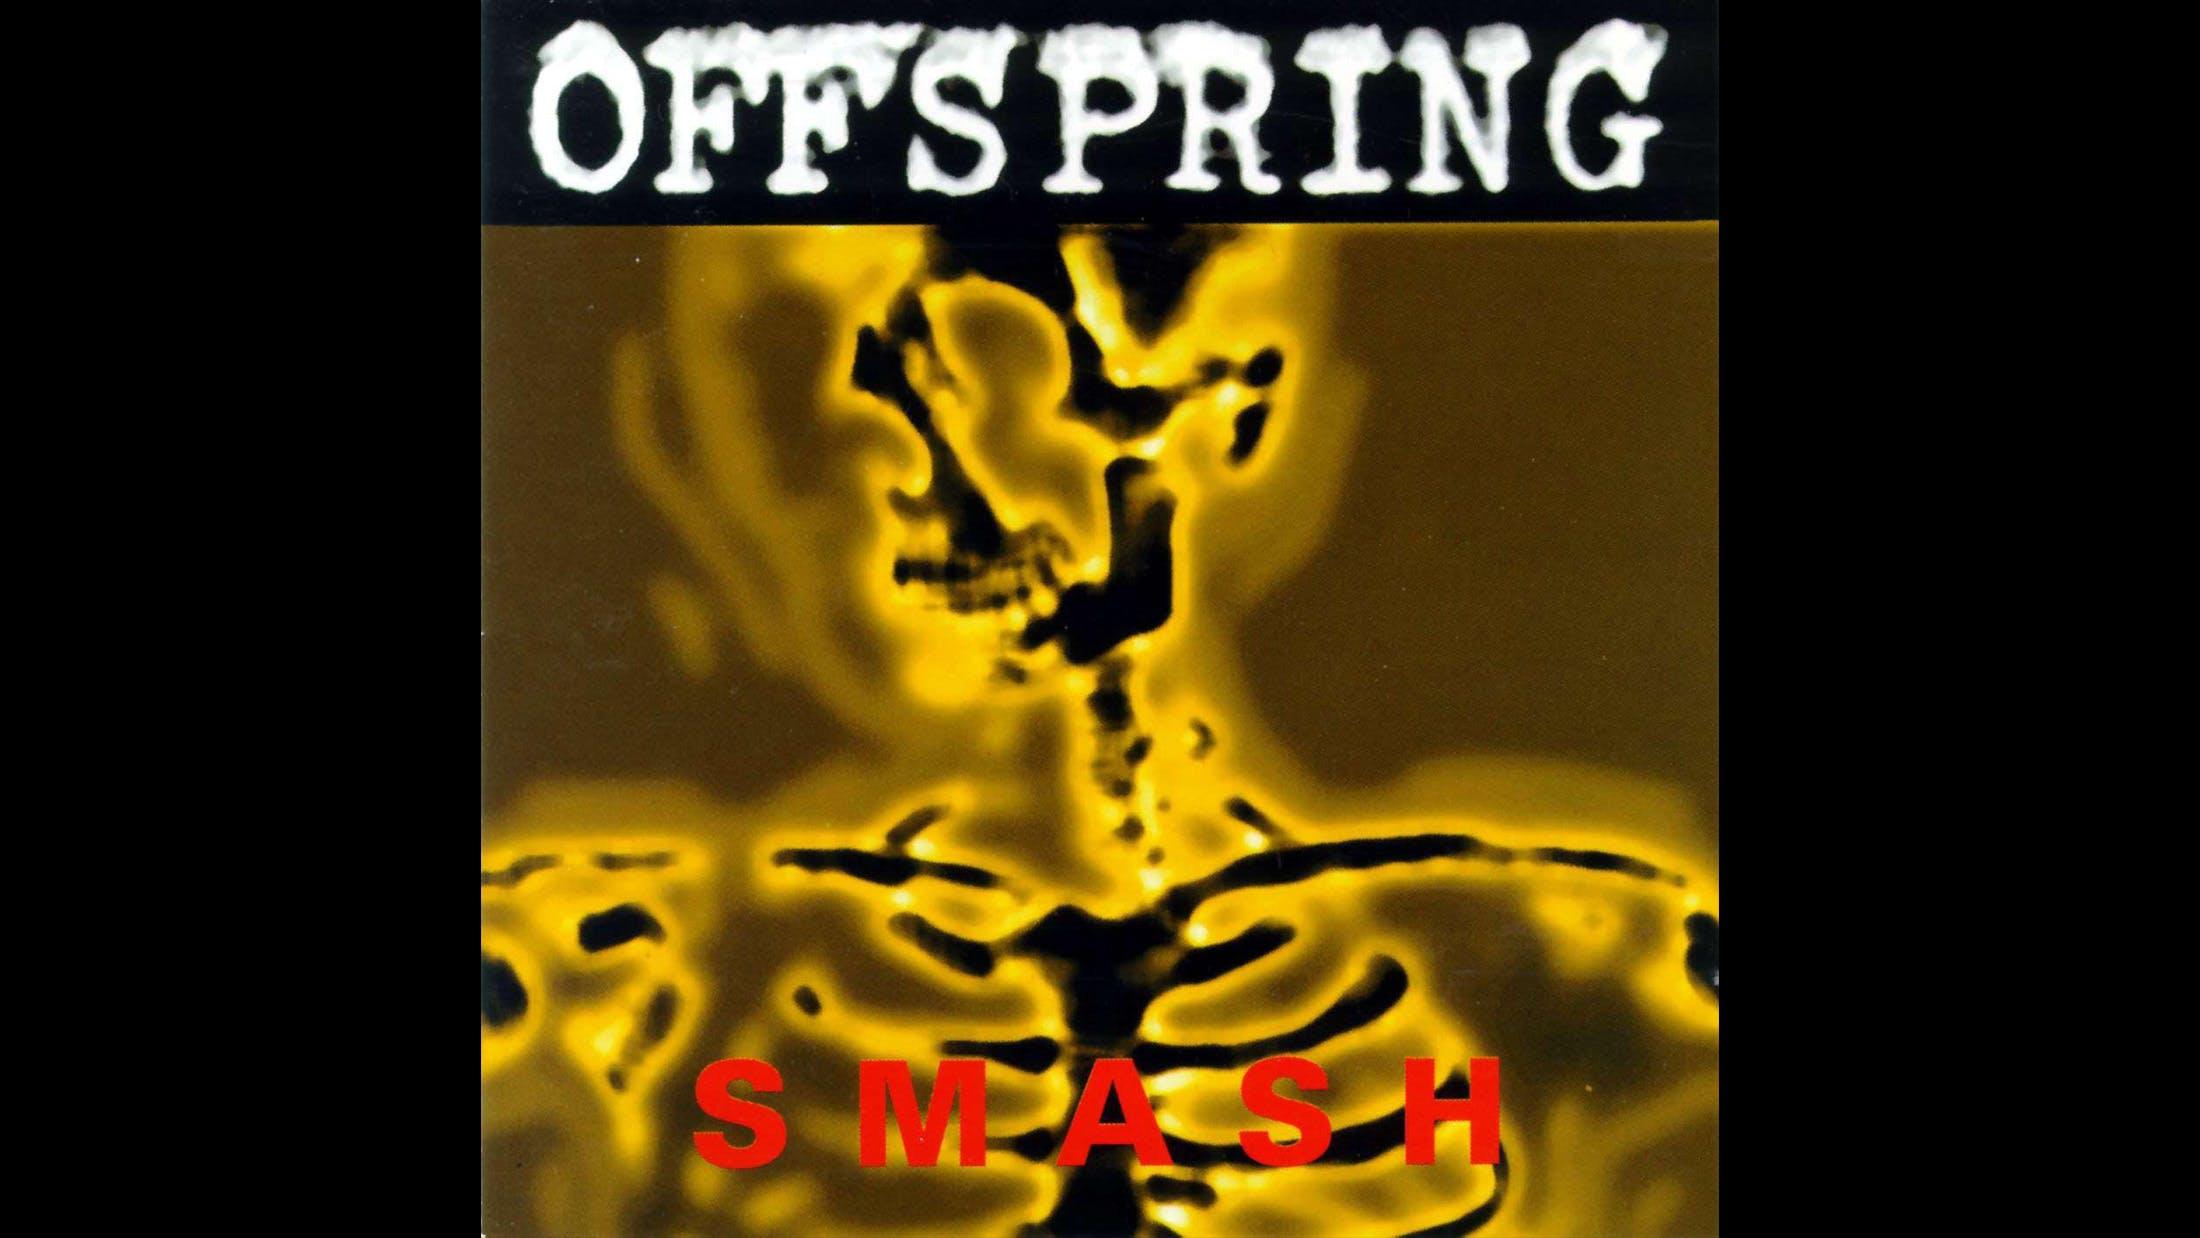 7. The Offspring - Smash (1994)